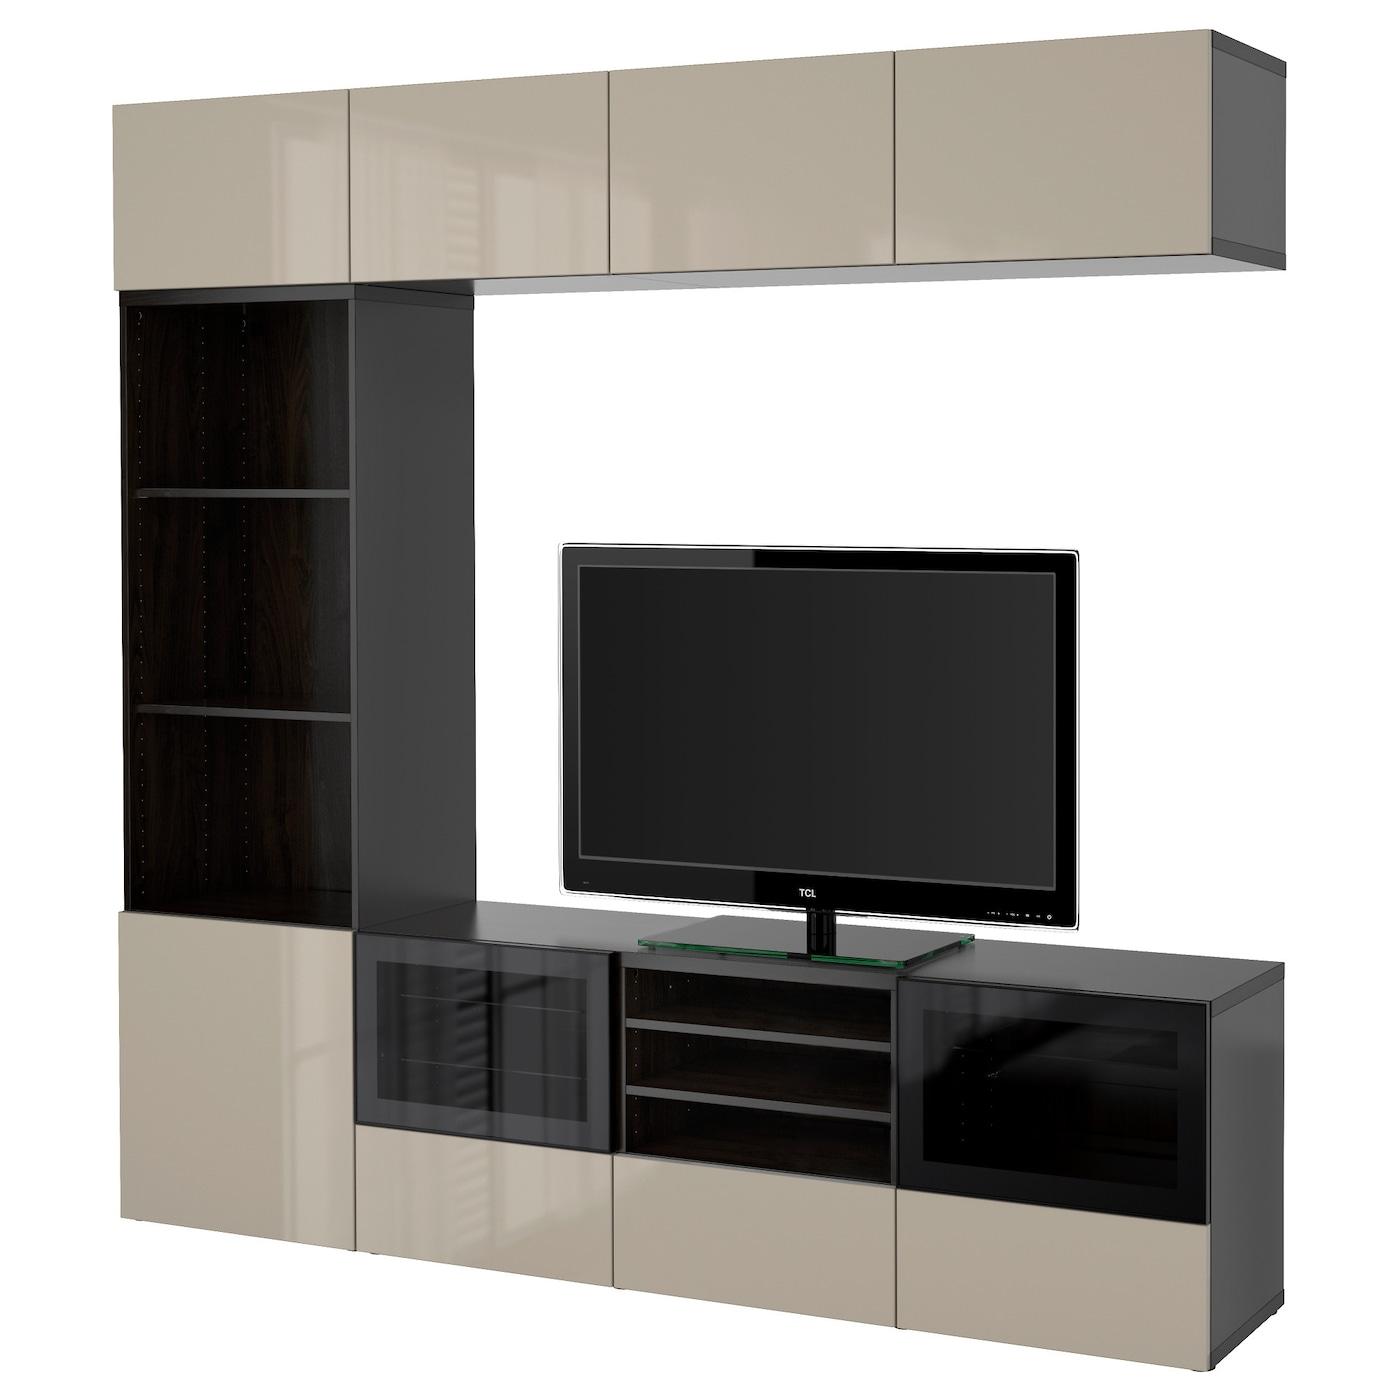 Best tv storage combination glass doors black brown for Meuble cd dvd ikea